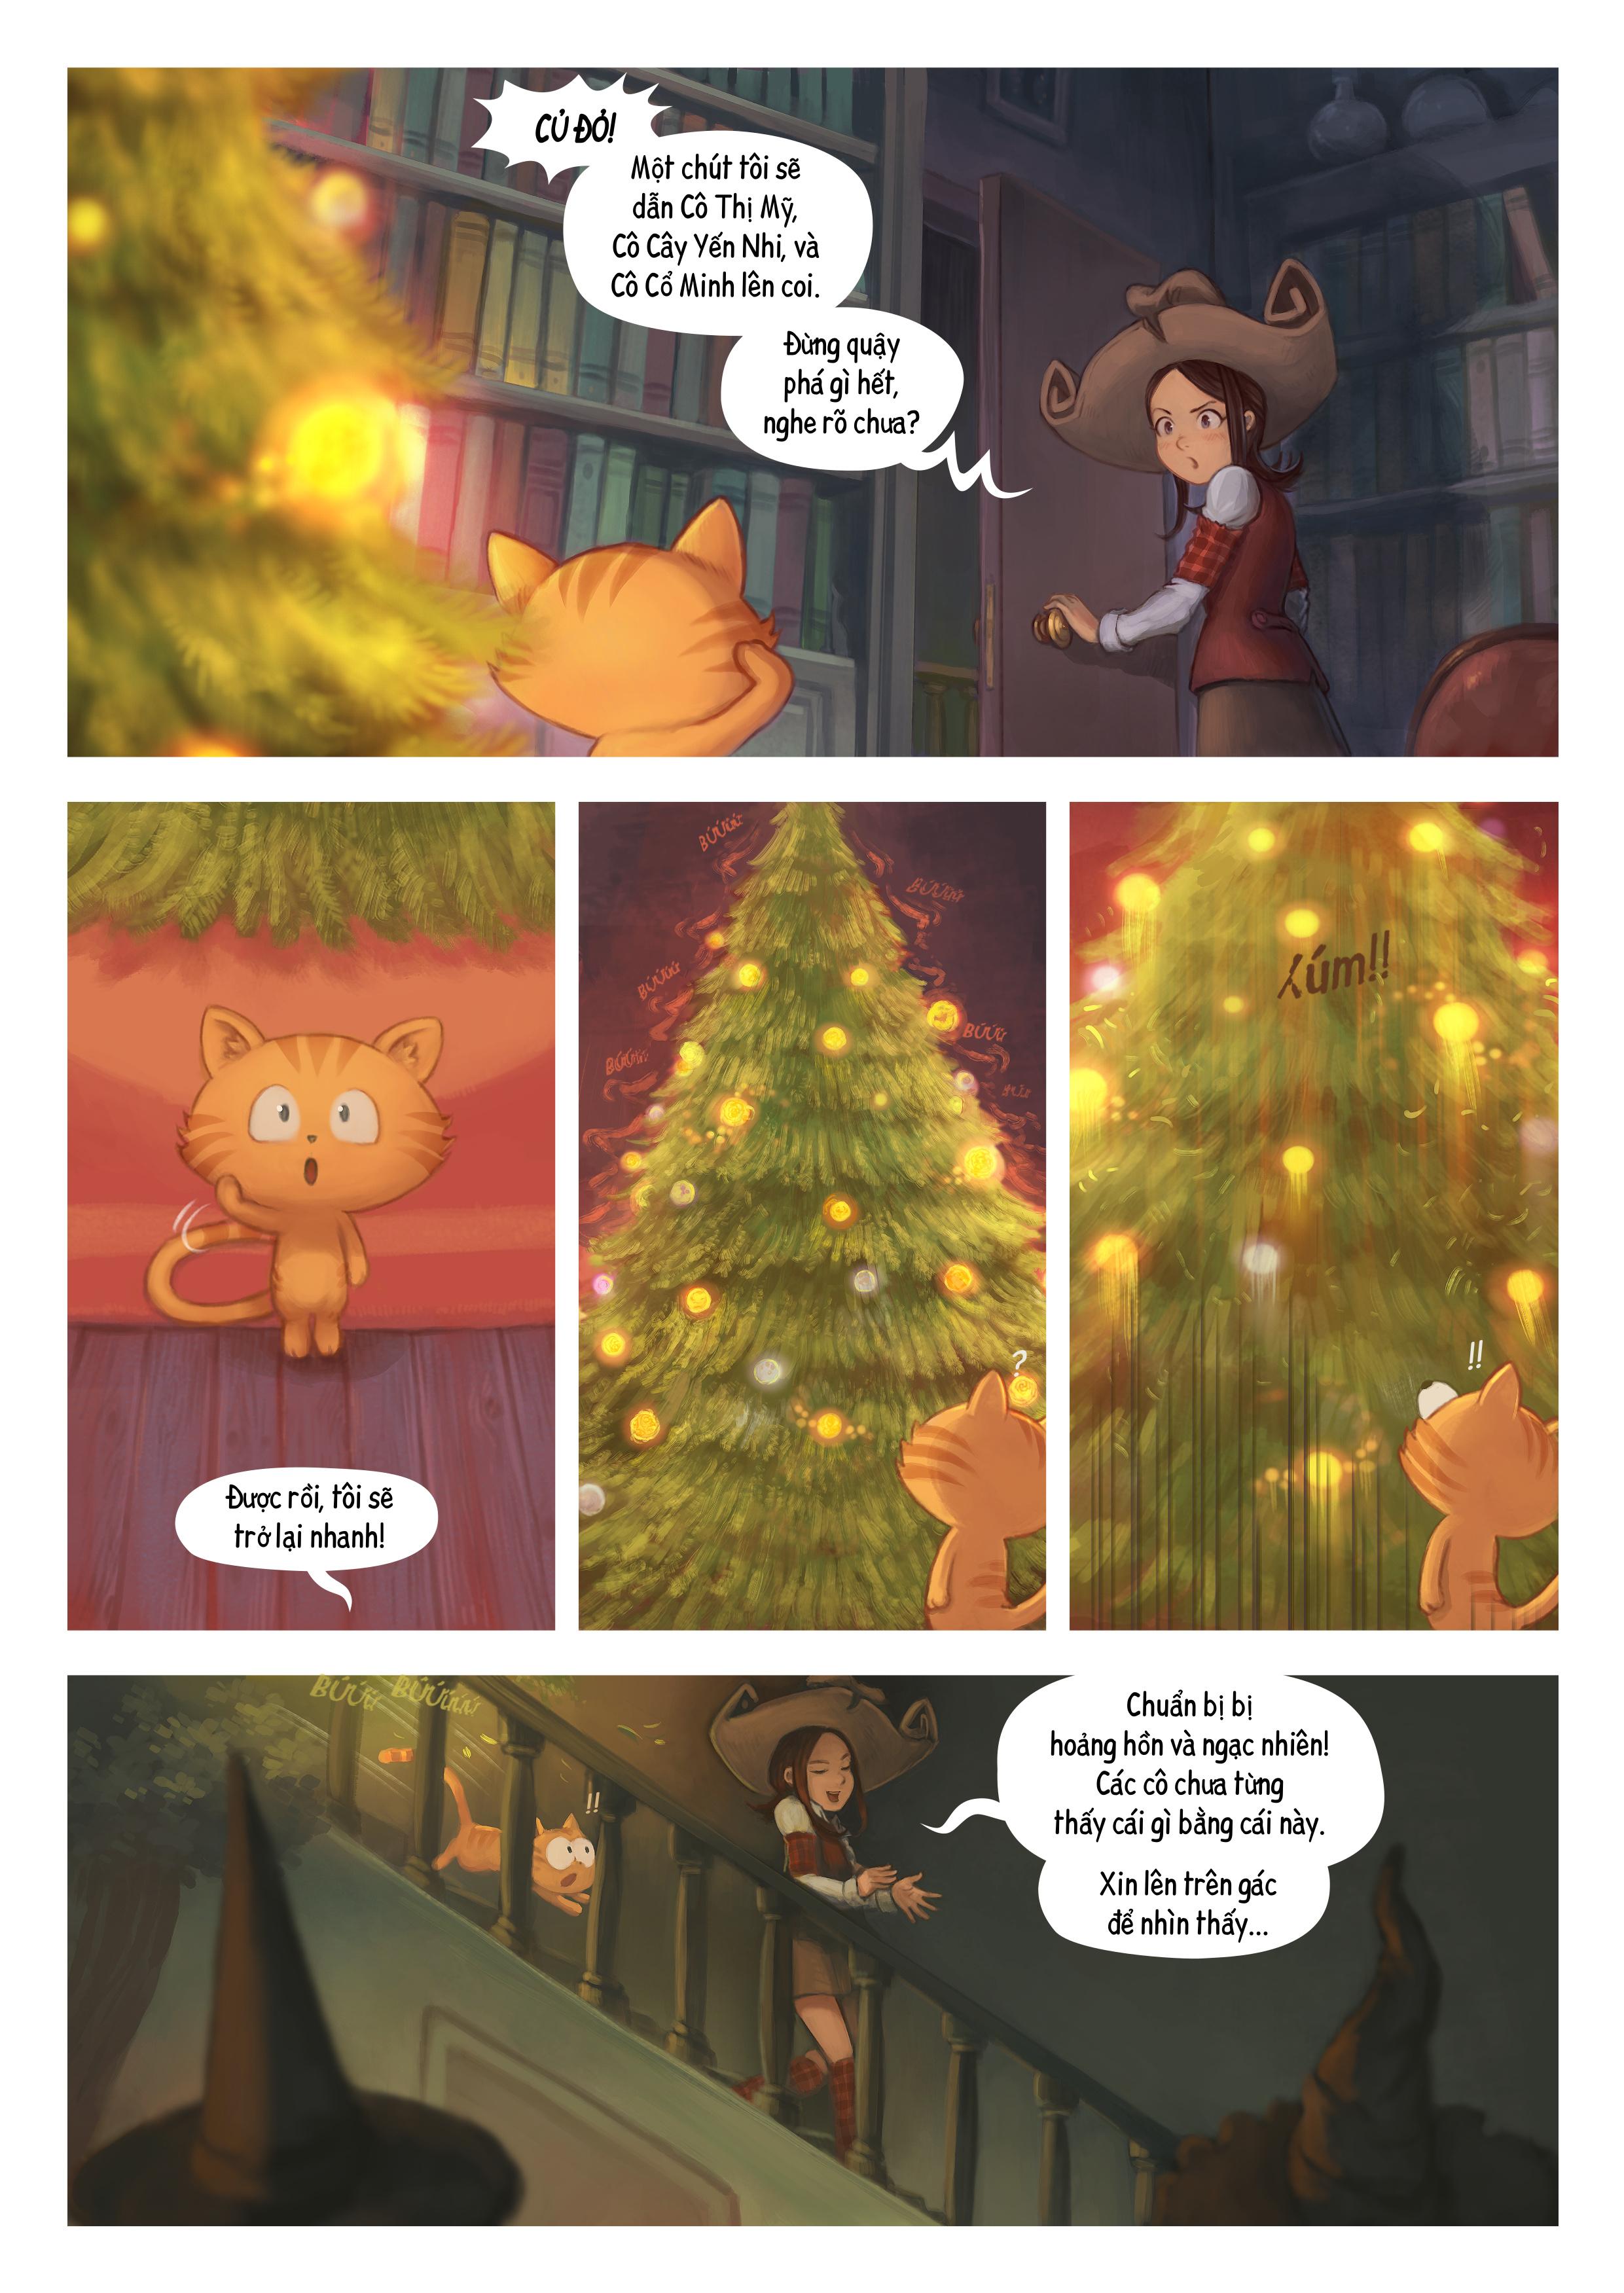 A webcomic page of Pepper&Carrot, Tập 24 [vi], trang 6